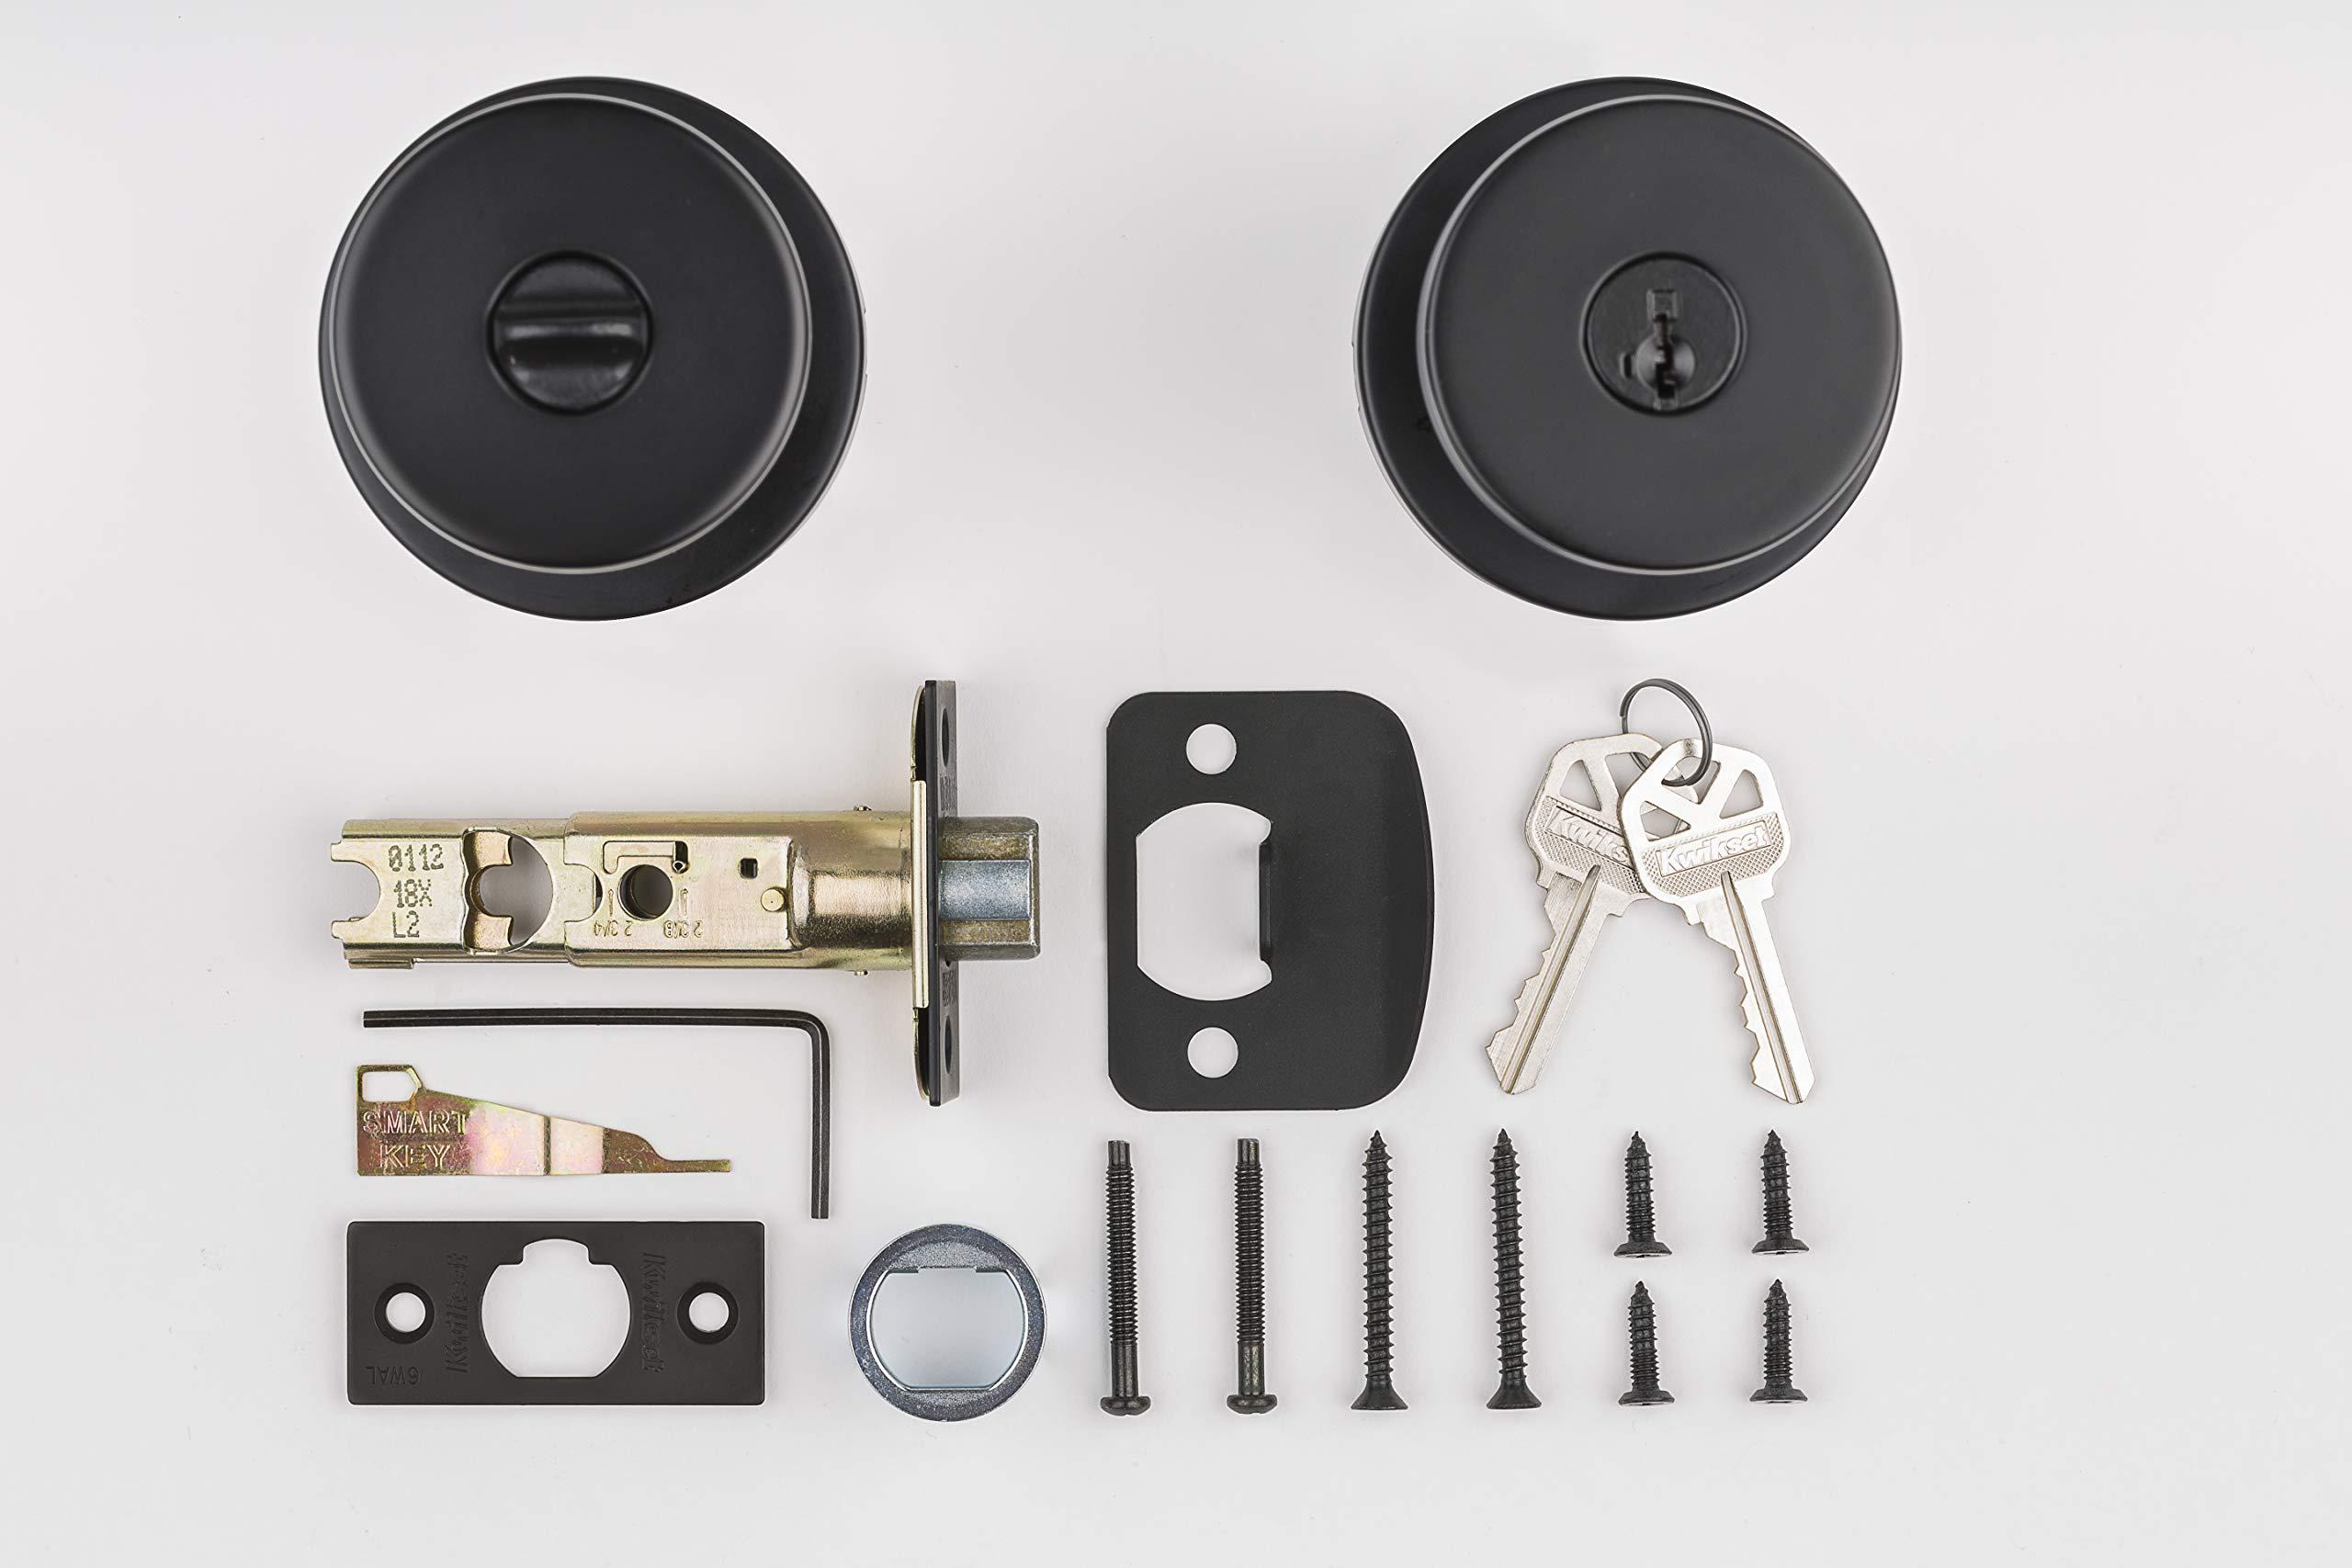 Kwikset 97402-854 Pismo Keyed Entry Door Knob Featuring SmartKey Security Iron Black by Kwikset (Image #7)